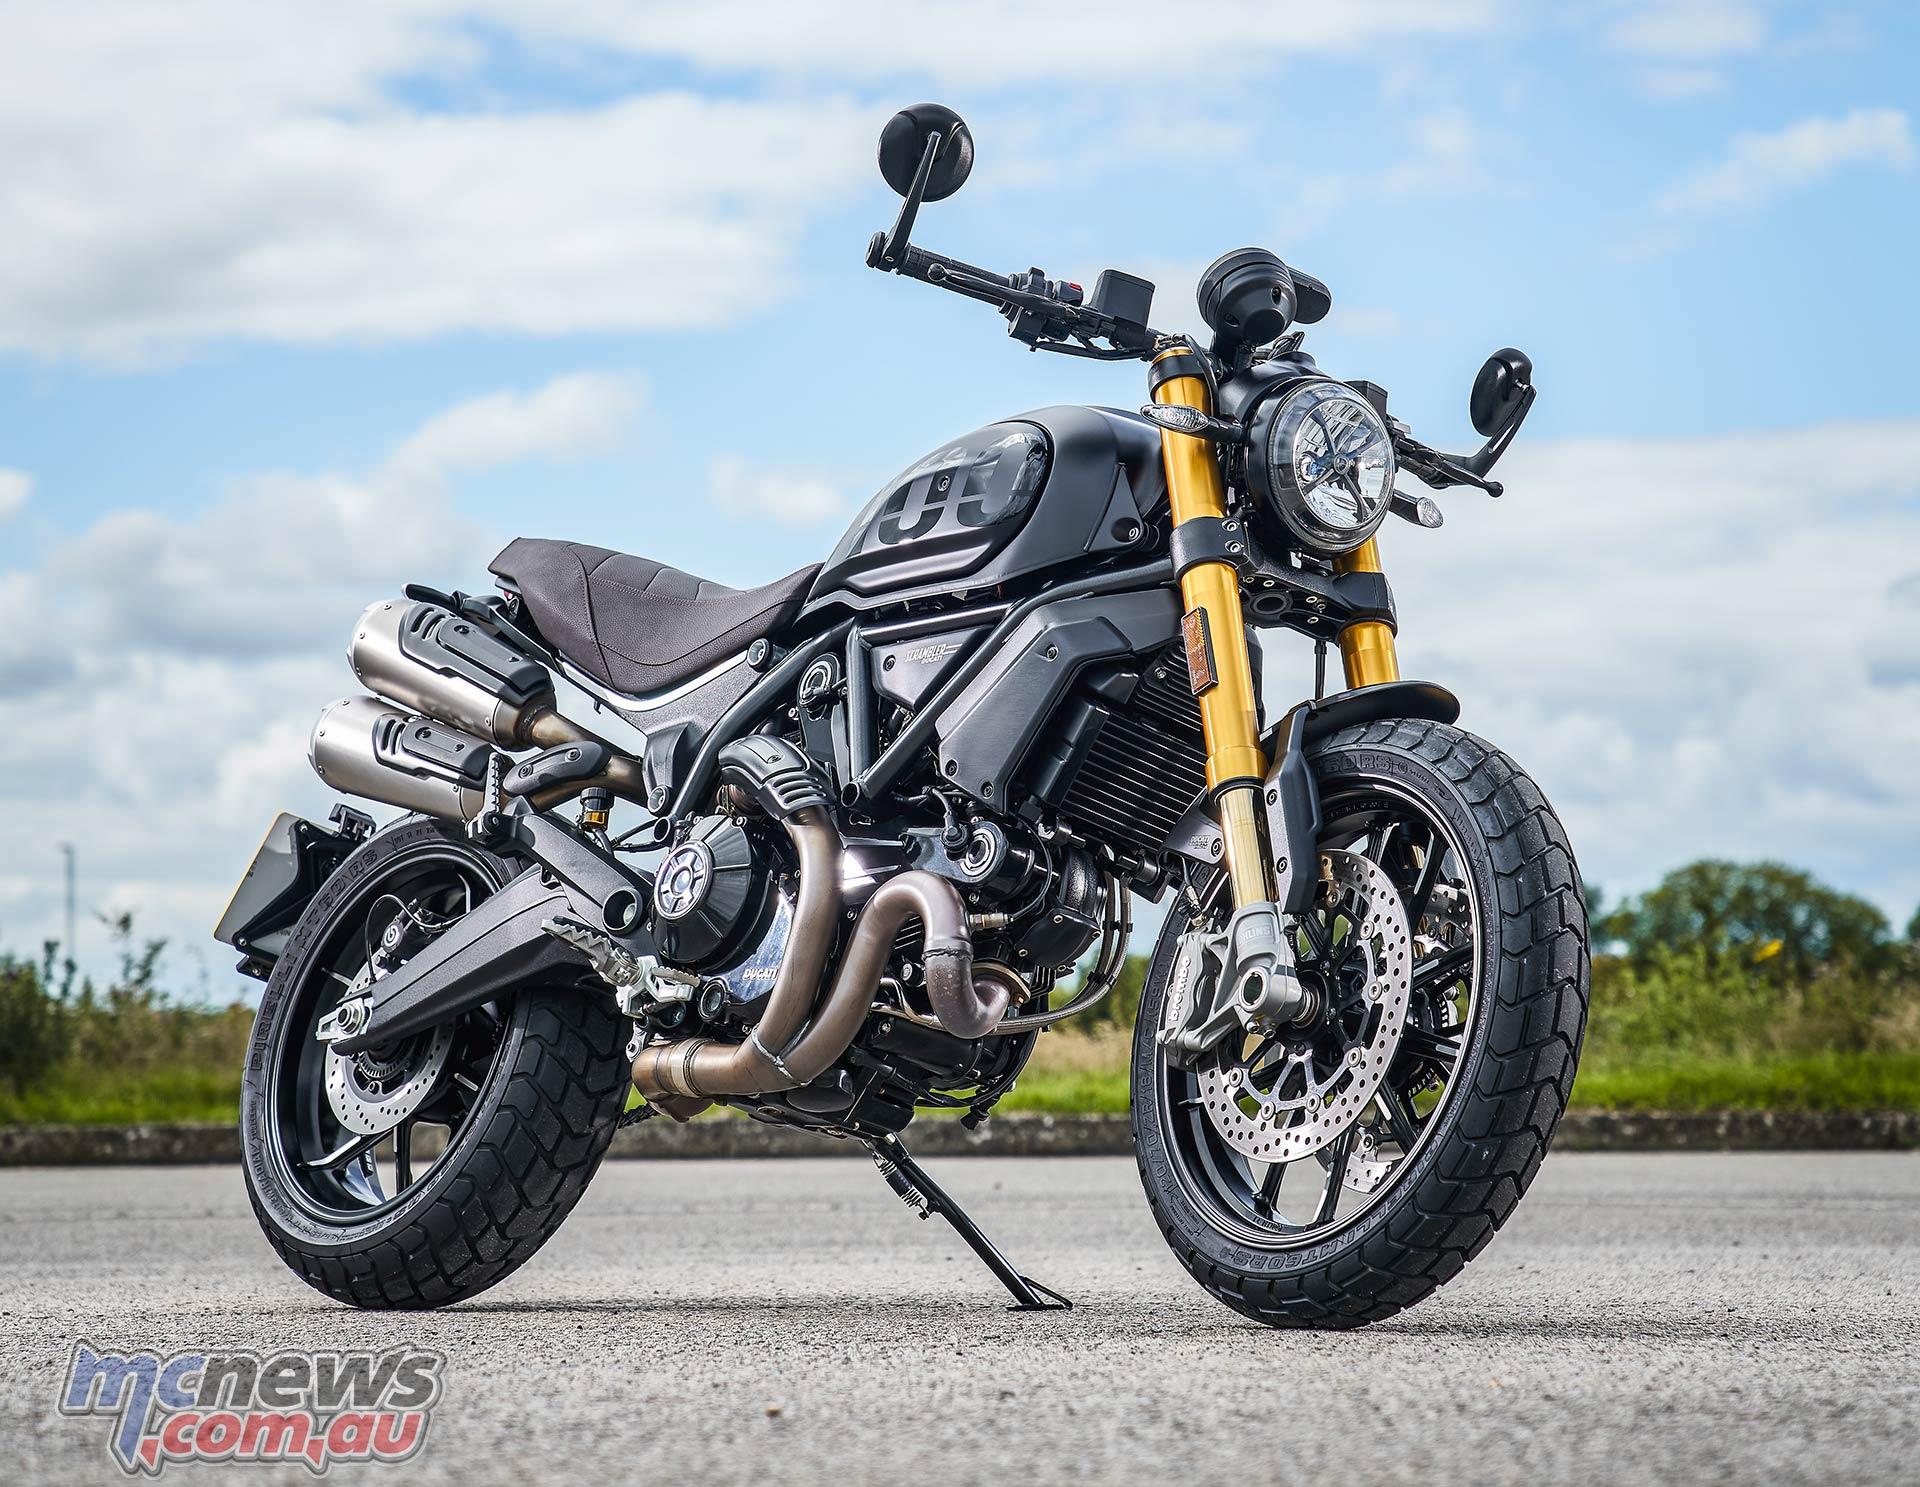 2021 Ducati Scrambler 1100 Sport Pro is in Matt Black everywhere apart form the brown seat